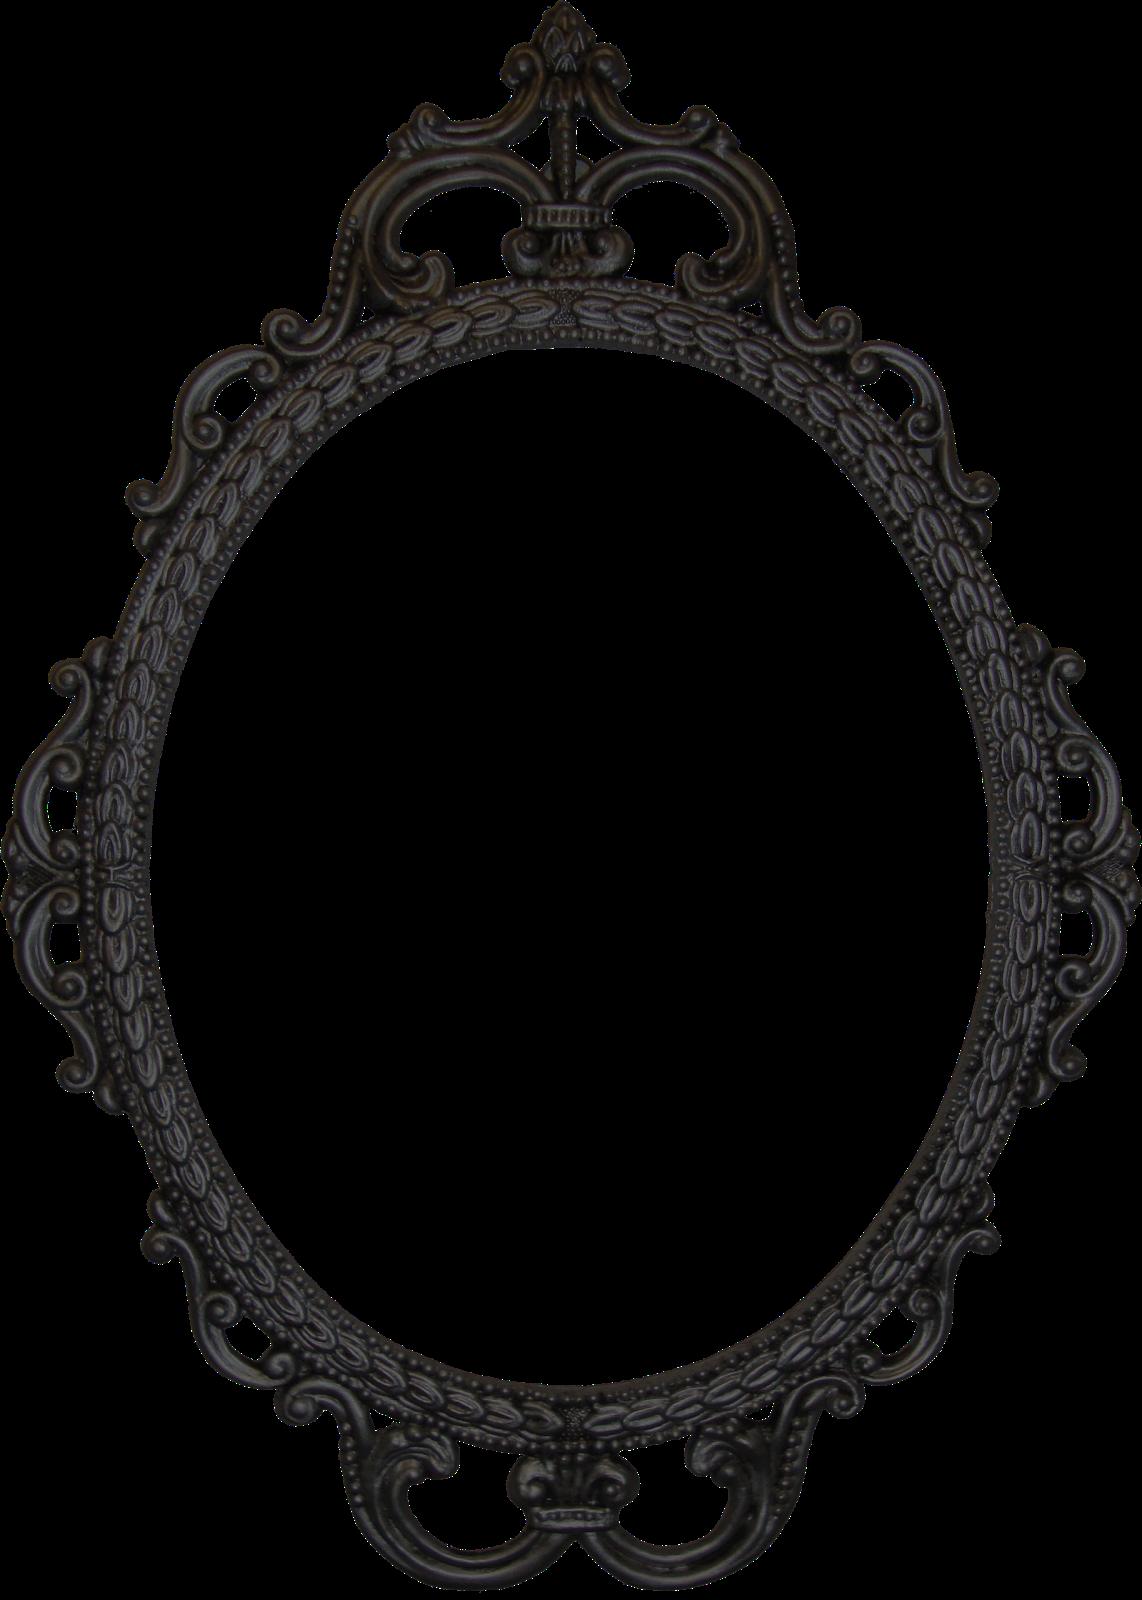 Free Digital Antique Photo Frames Antique Photo Frames Digital Frame Oval Frame